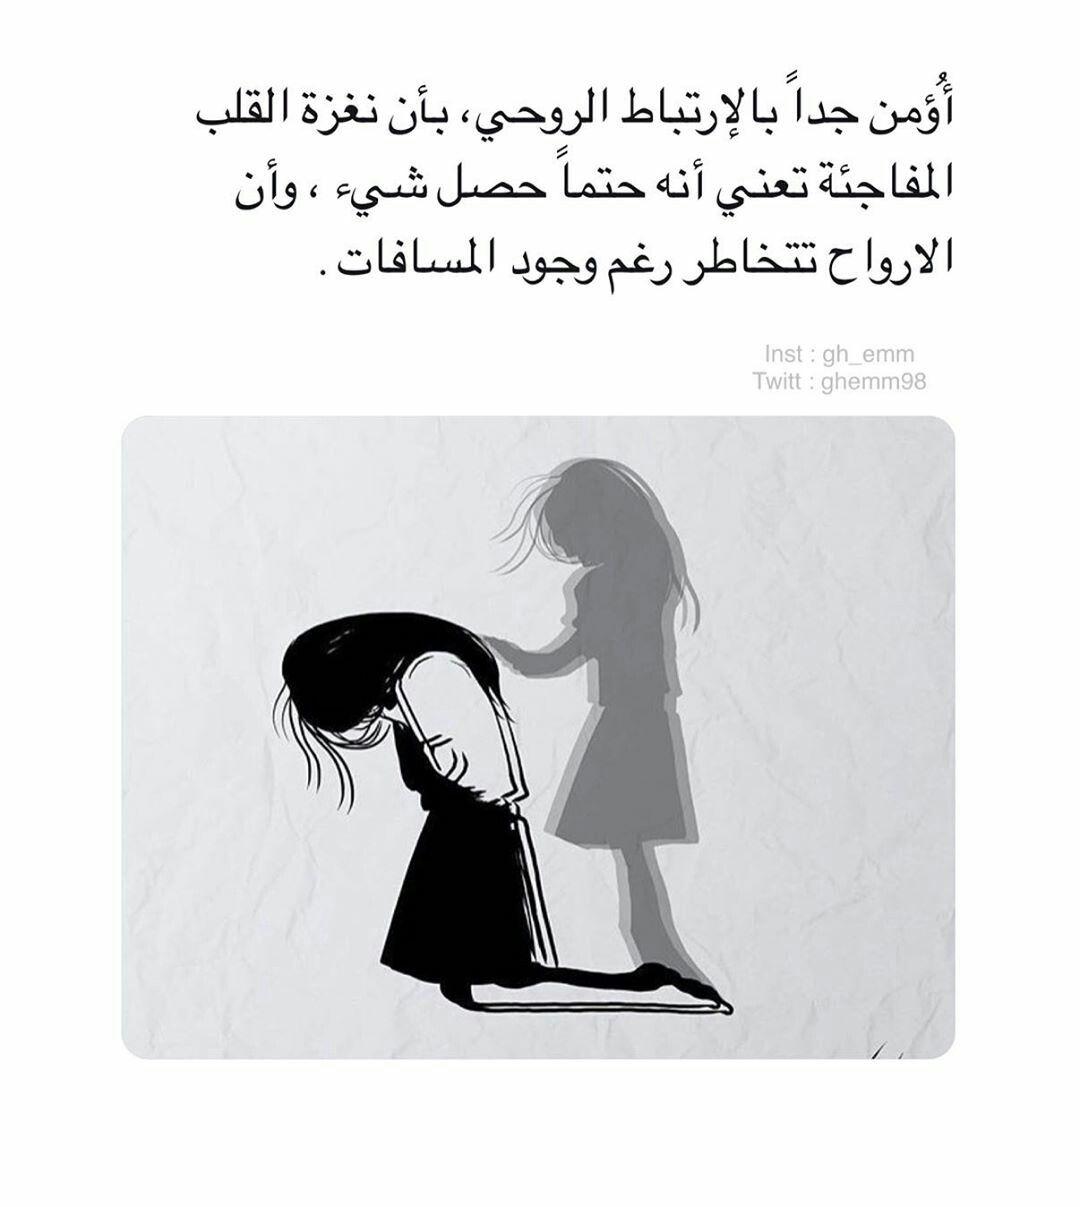 Pin By فلسطينية ولي الفخر On ليتها تقرأ Memes Art Ecard Meme